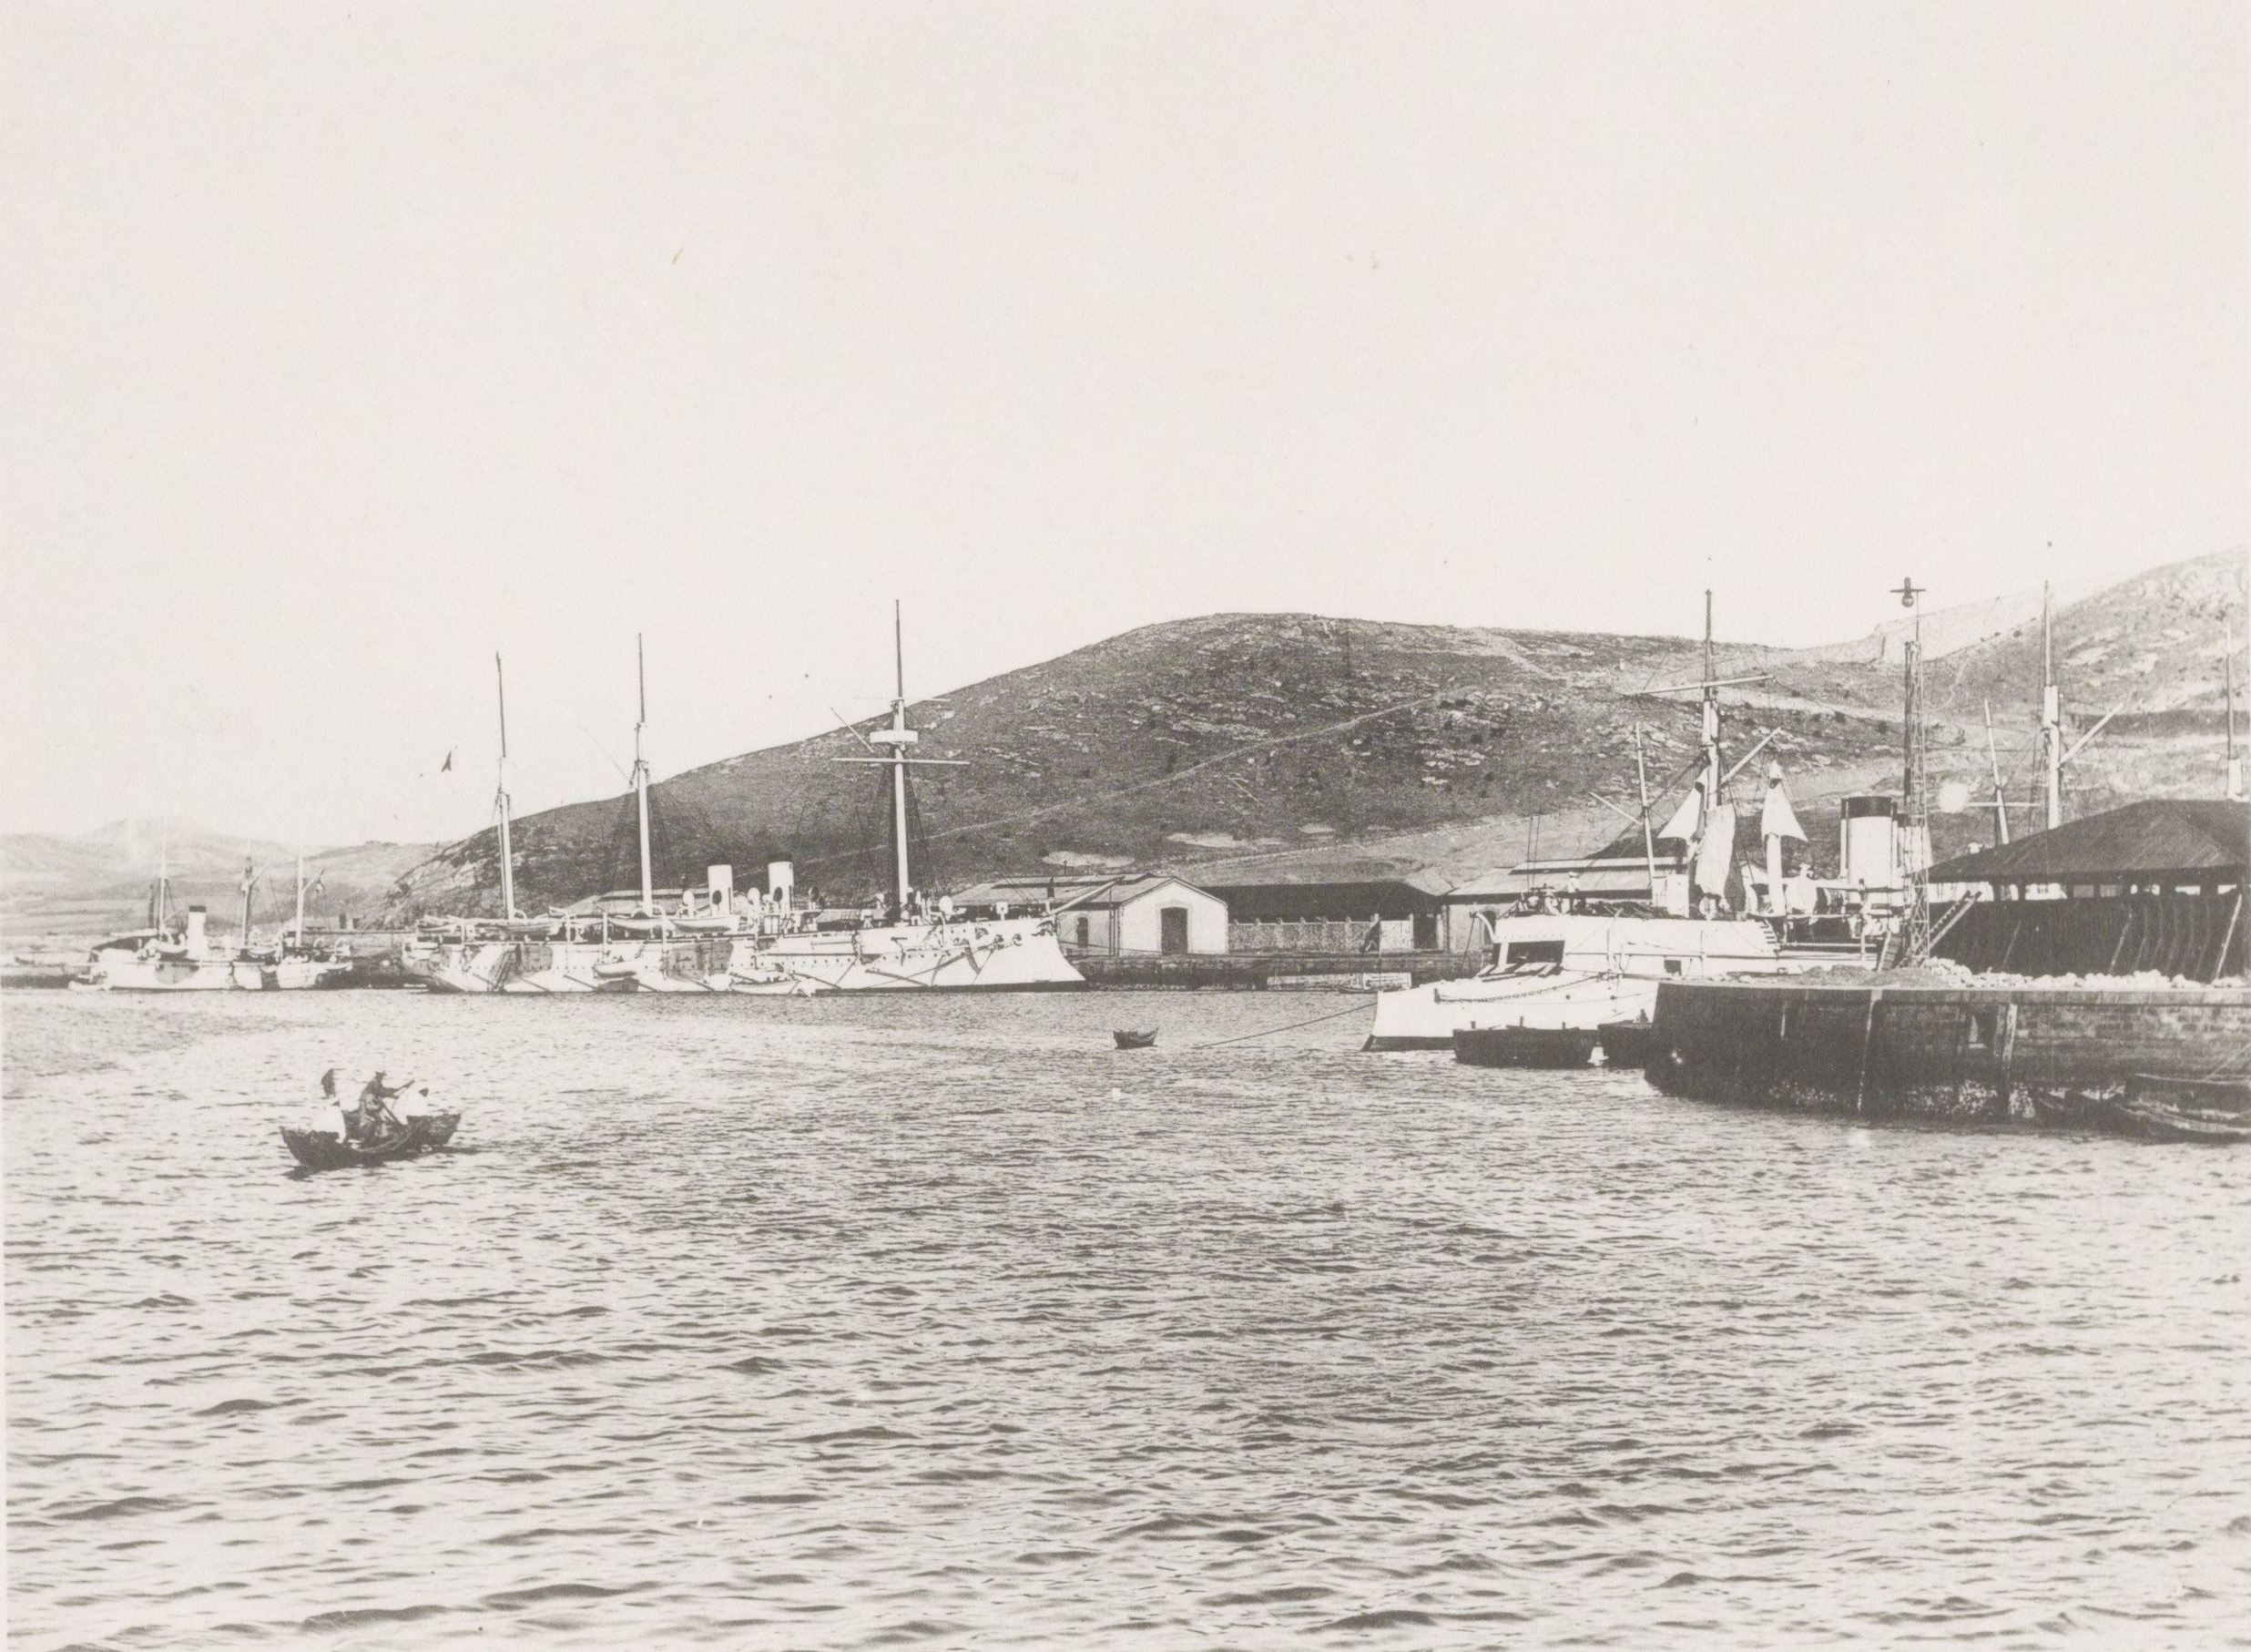 Вид кораблей и лодок у пристани